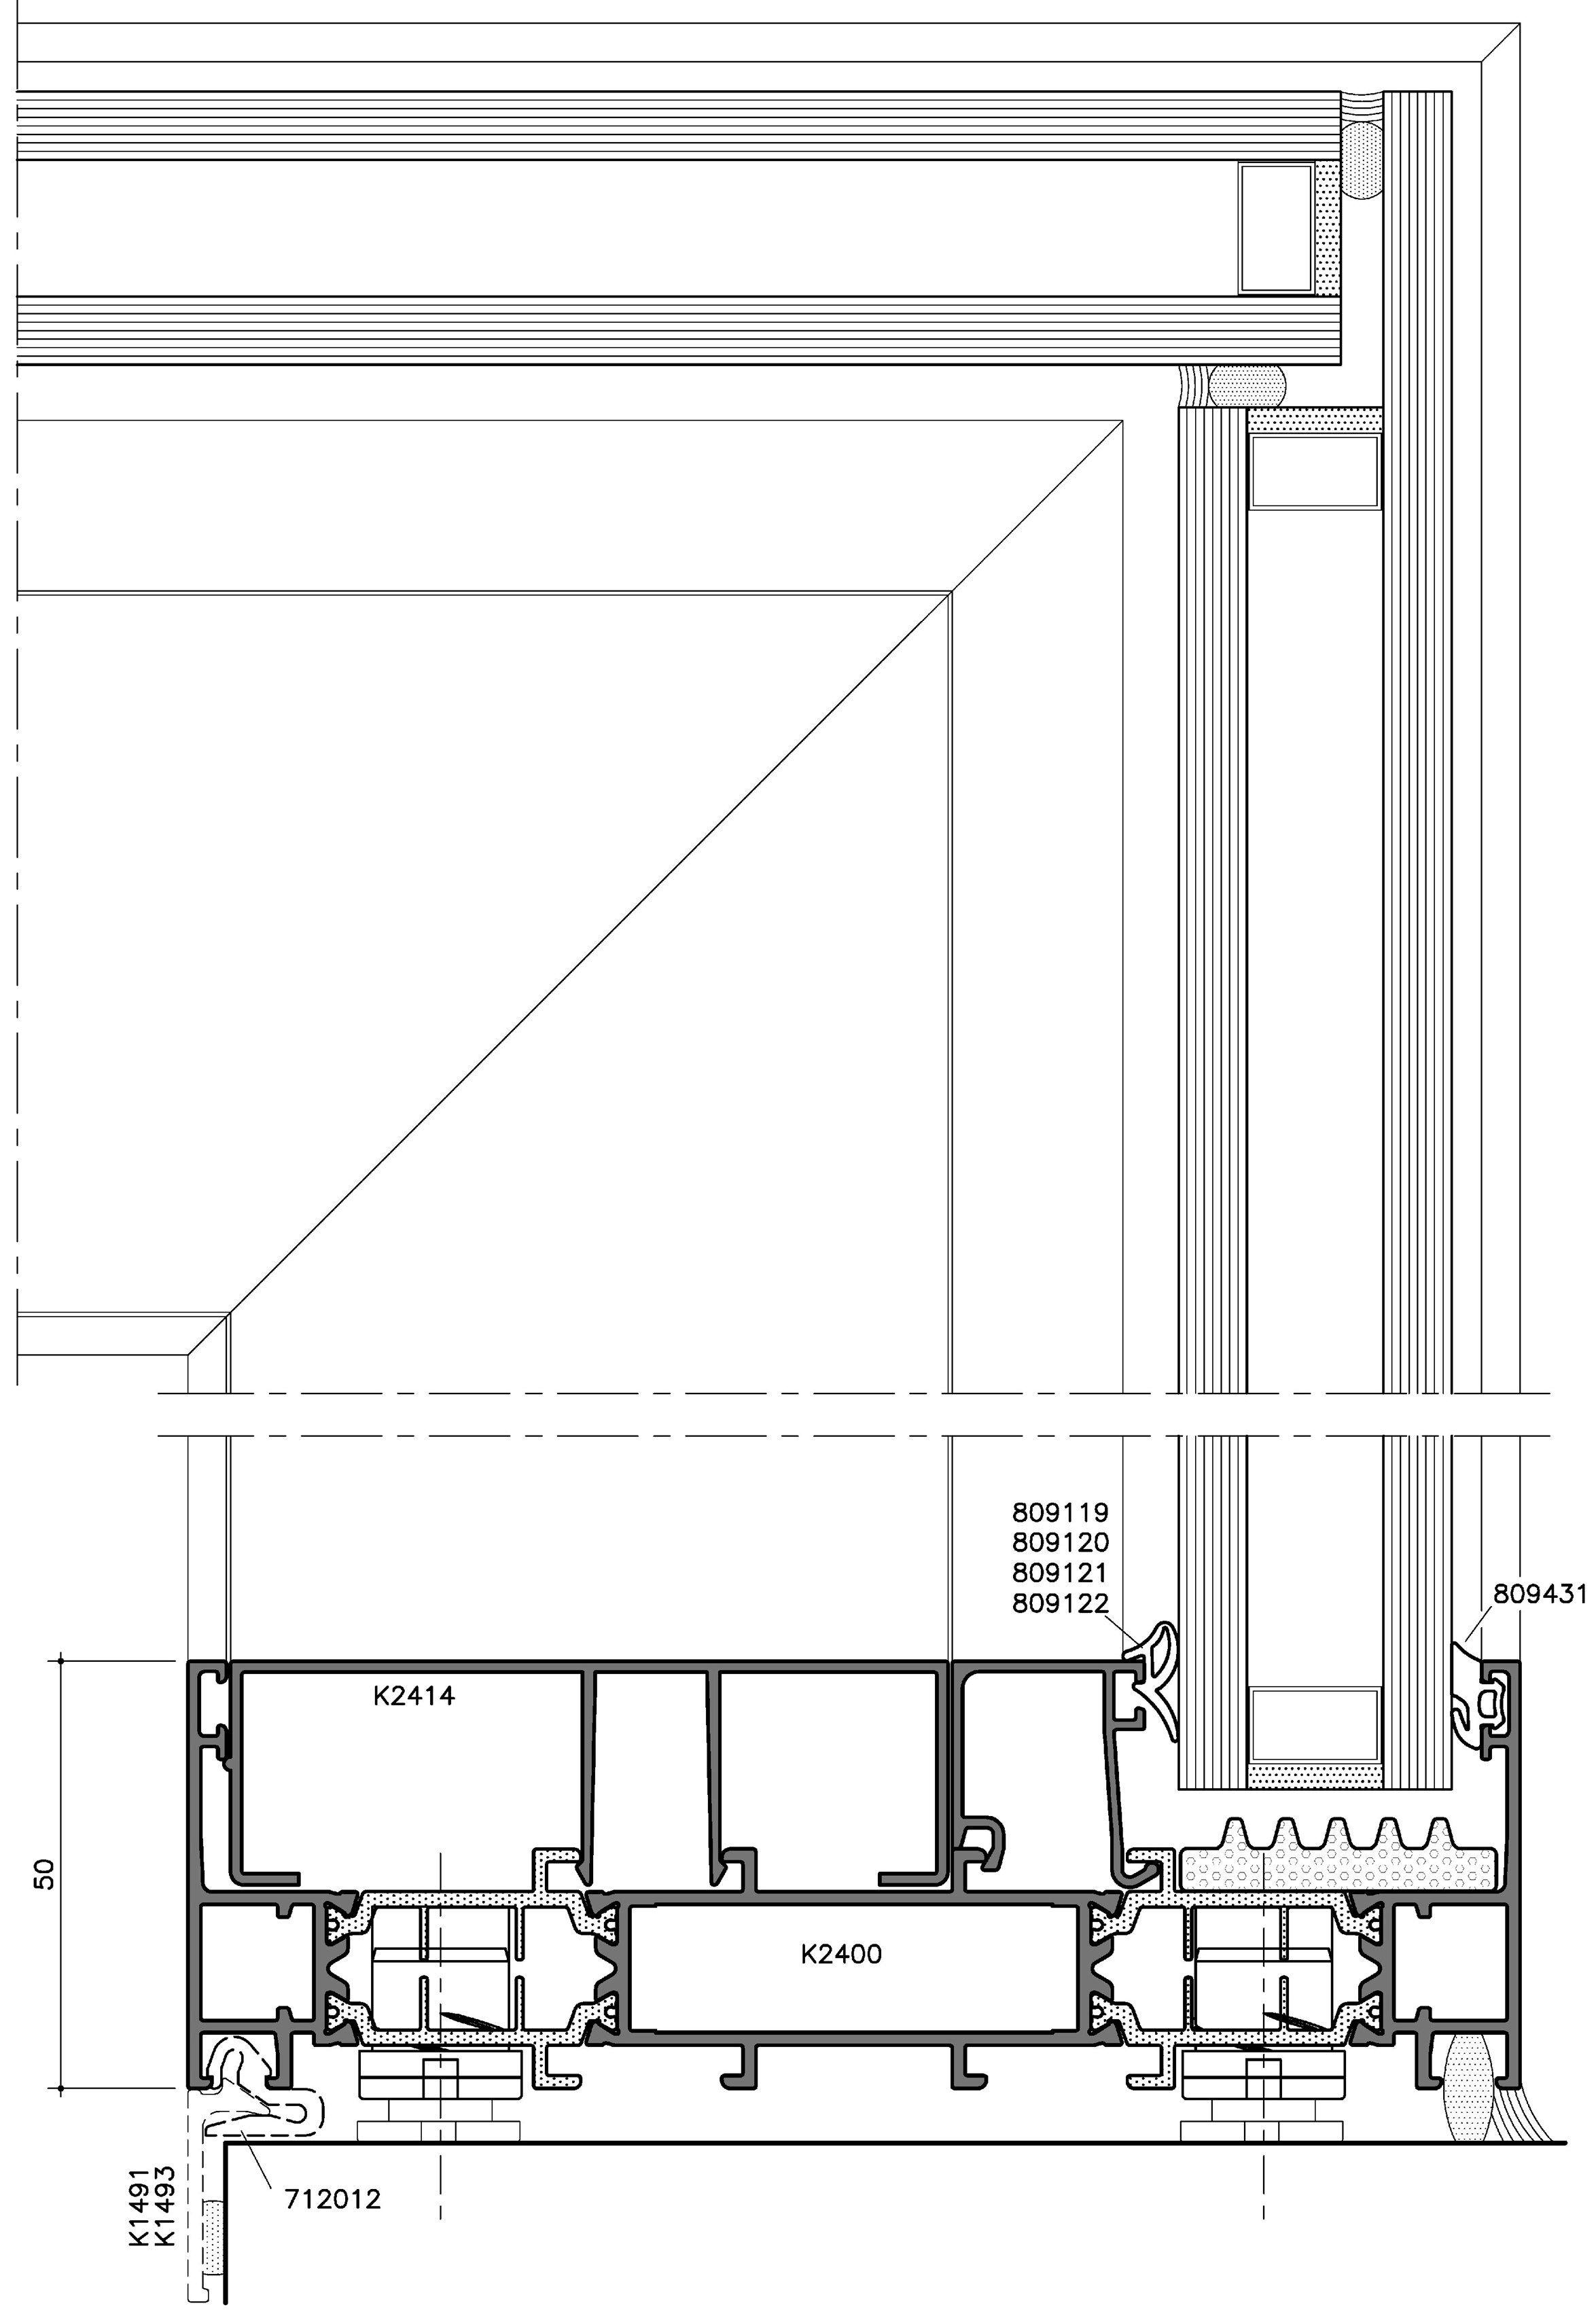 Sc156tt finestra alzante scorrevole by aluk group - Finestre scorrevoli pianta ...